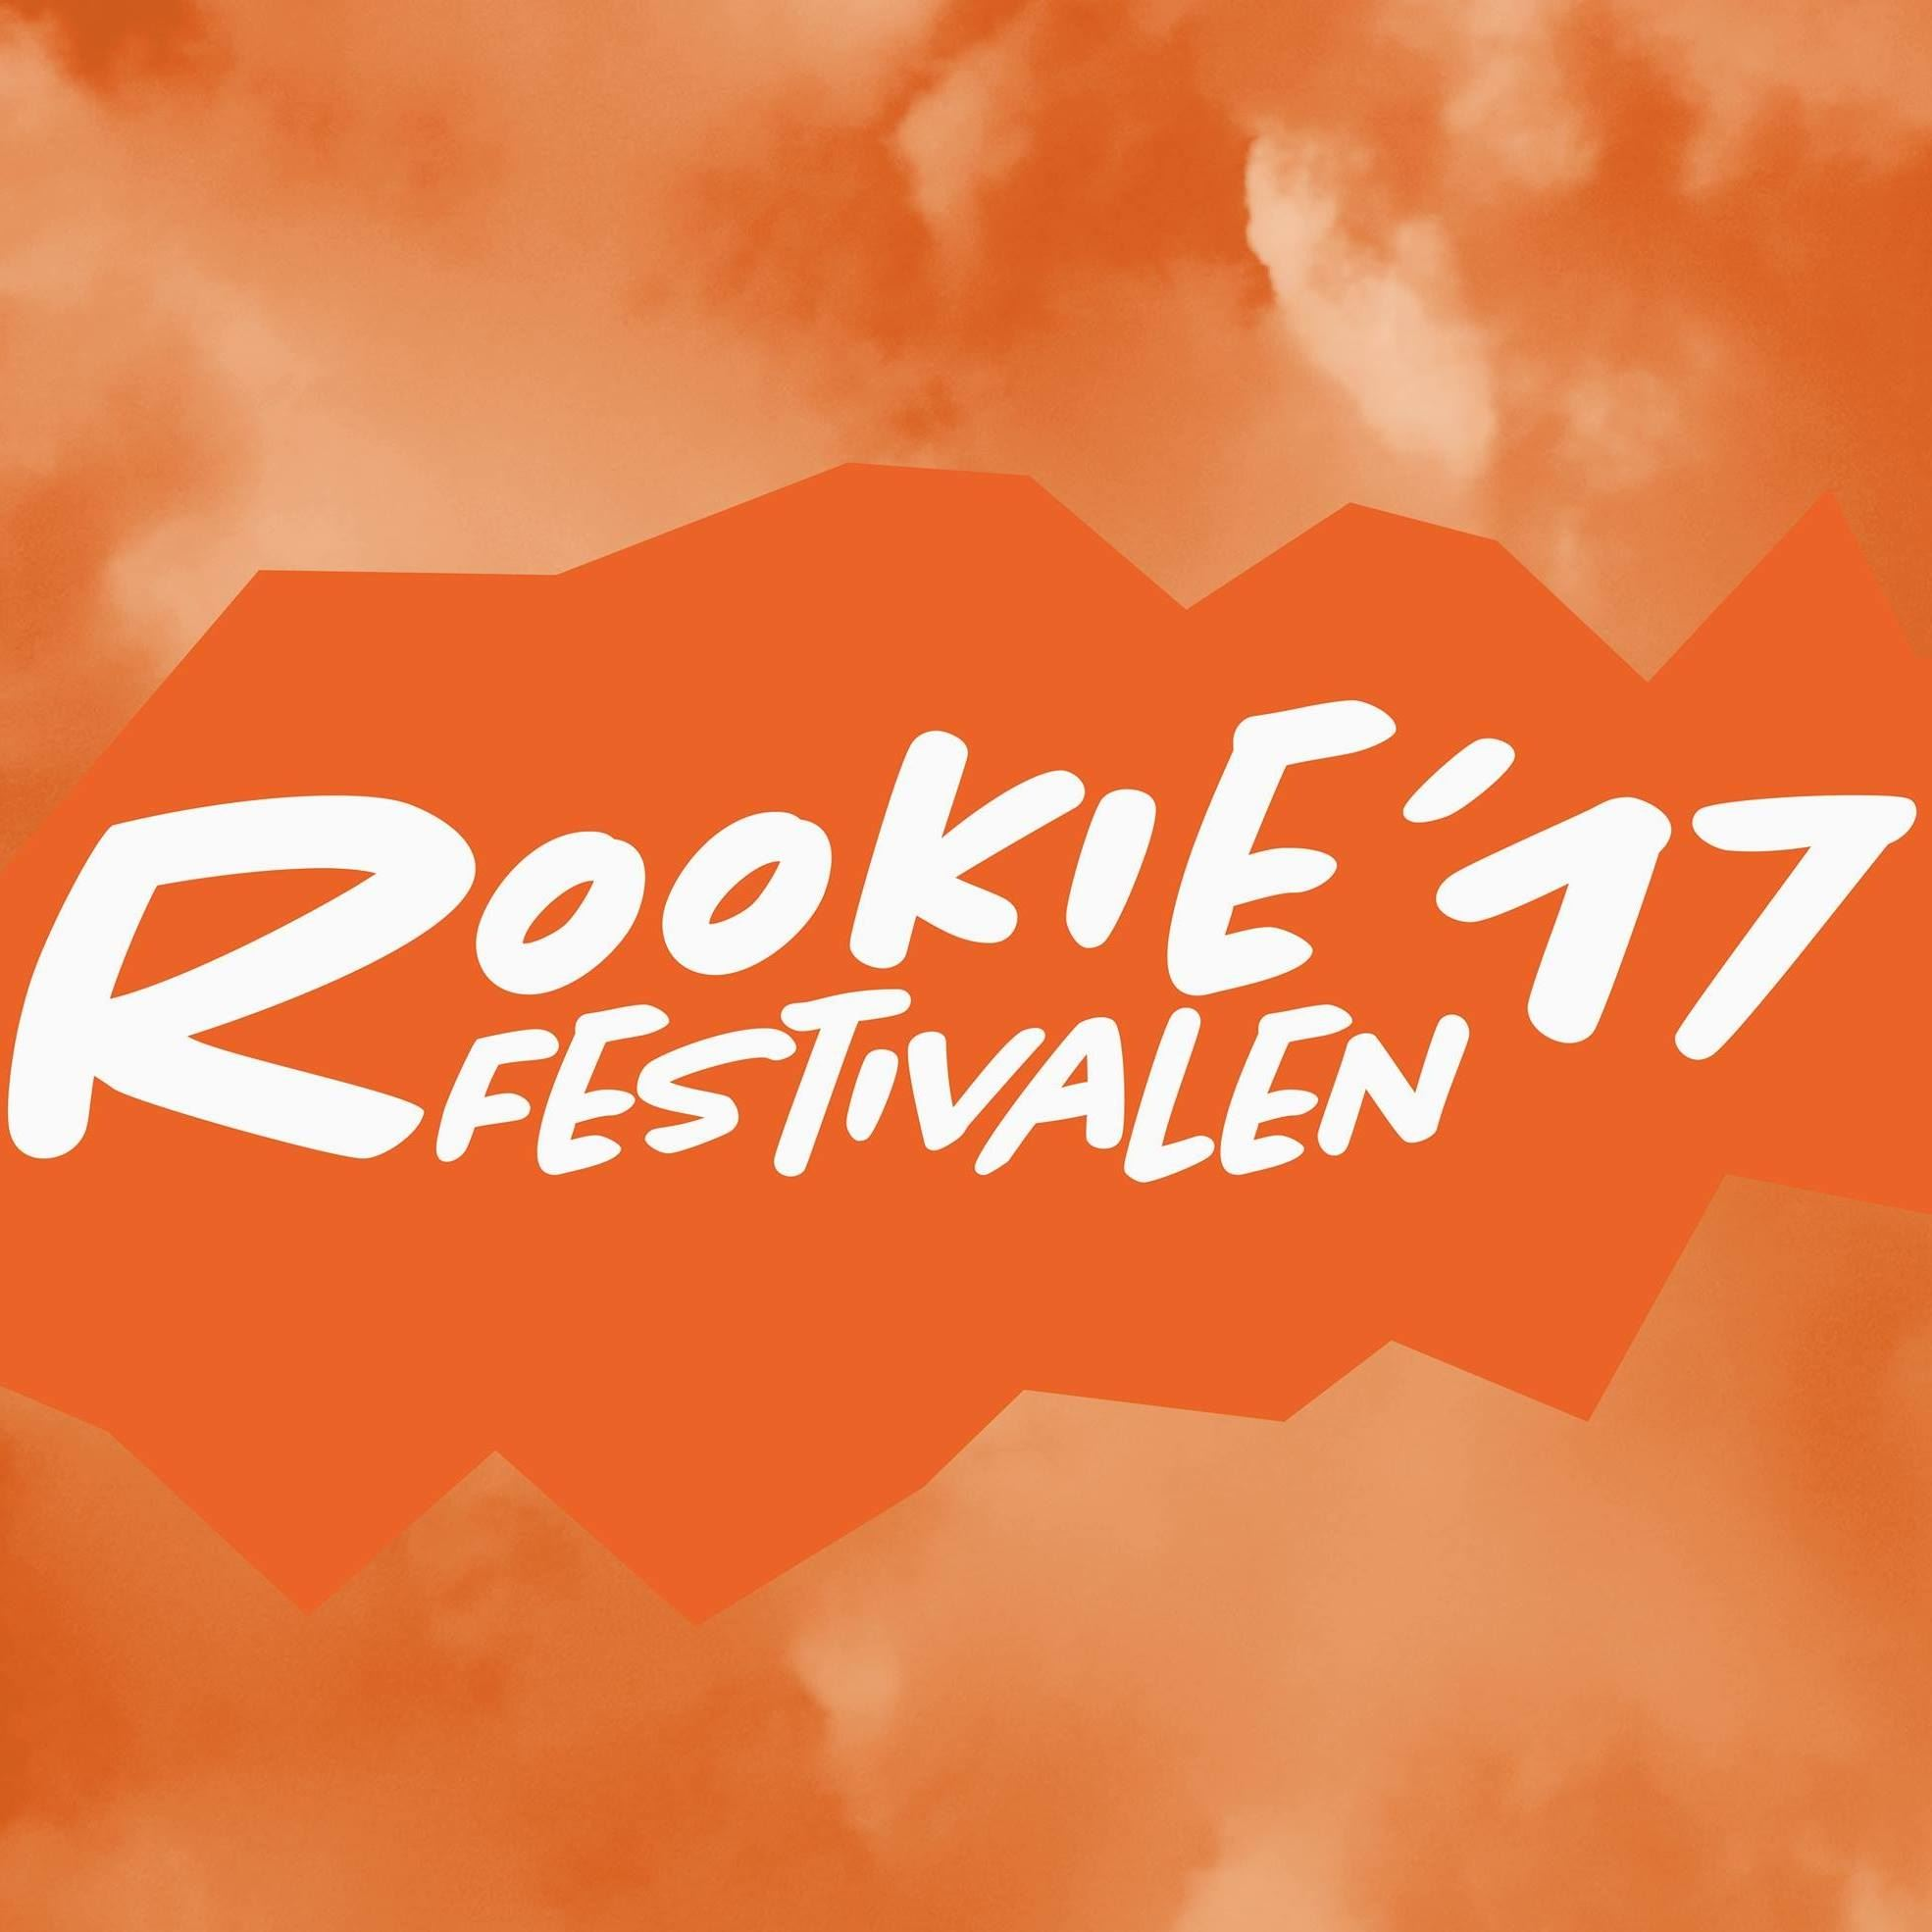 Rookiefestivalen 2017